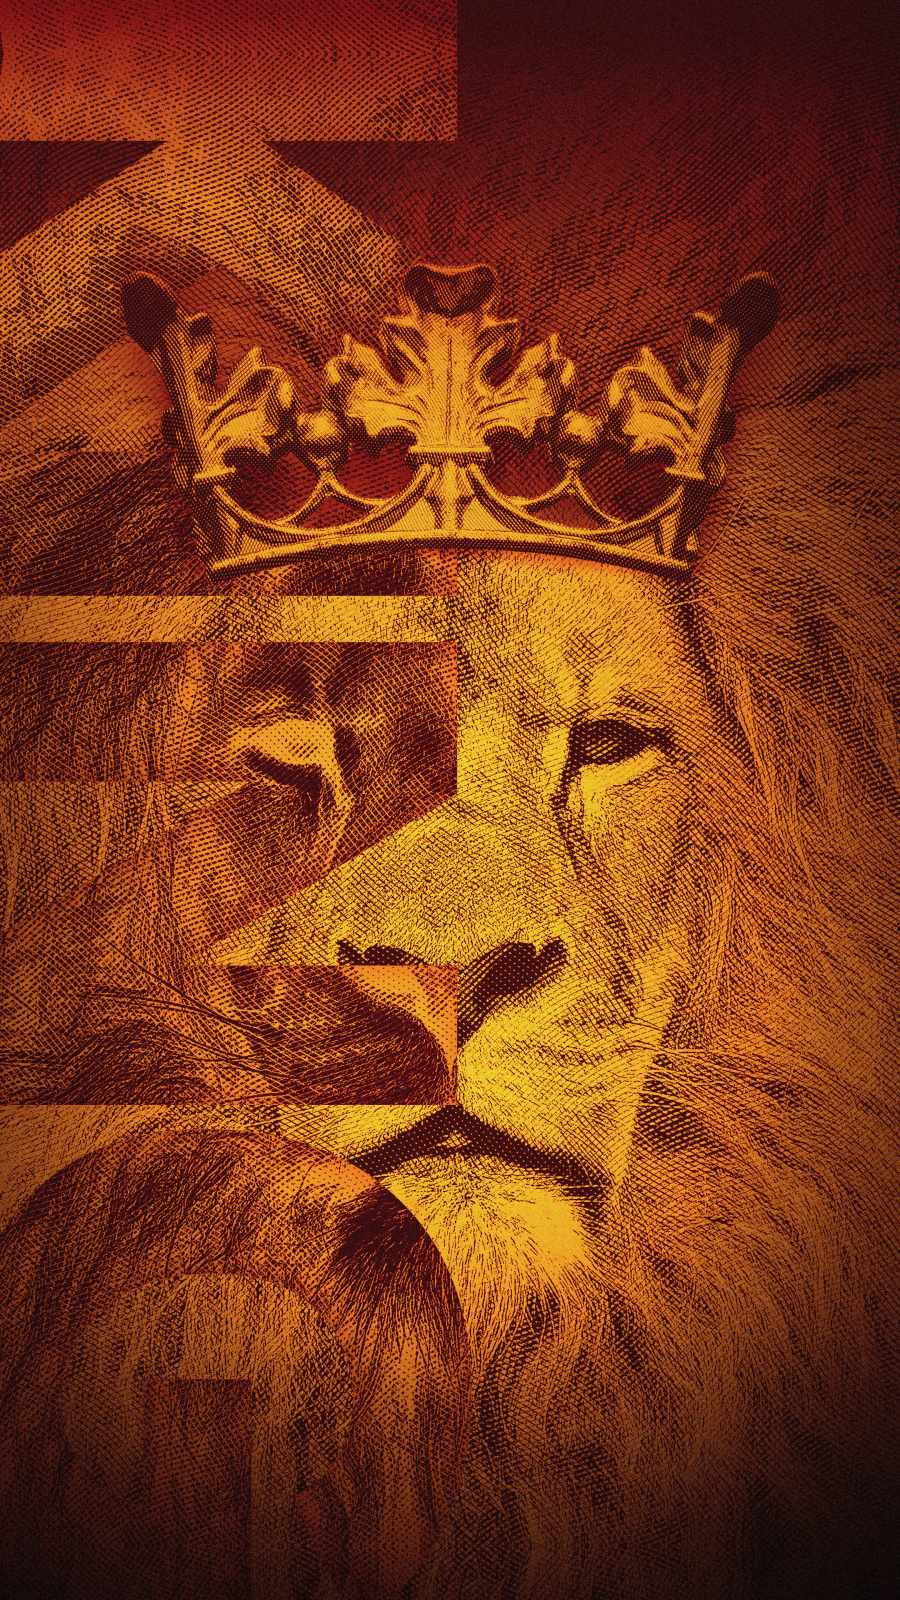 King Lion Art iPhone Wallpaper